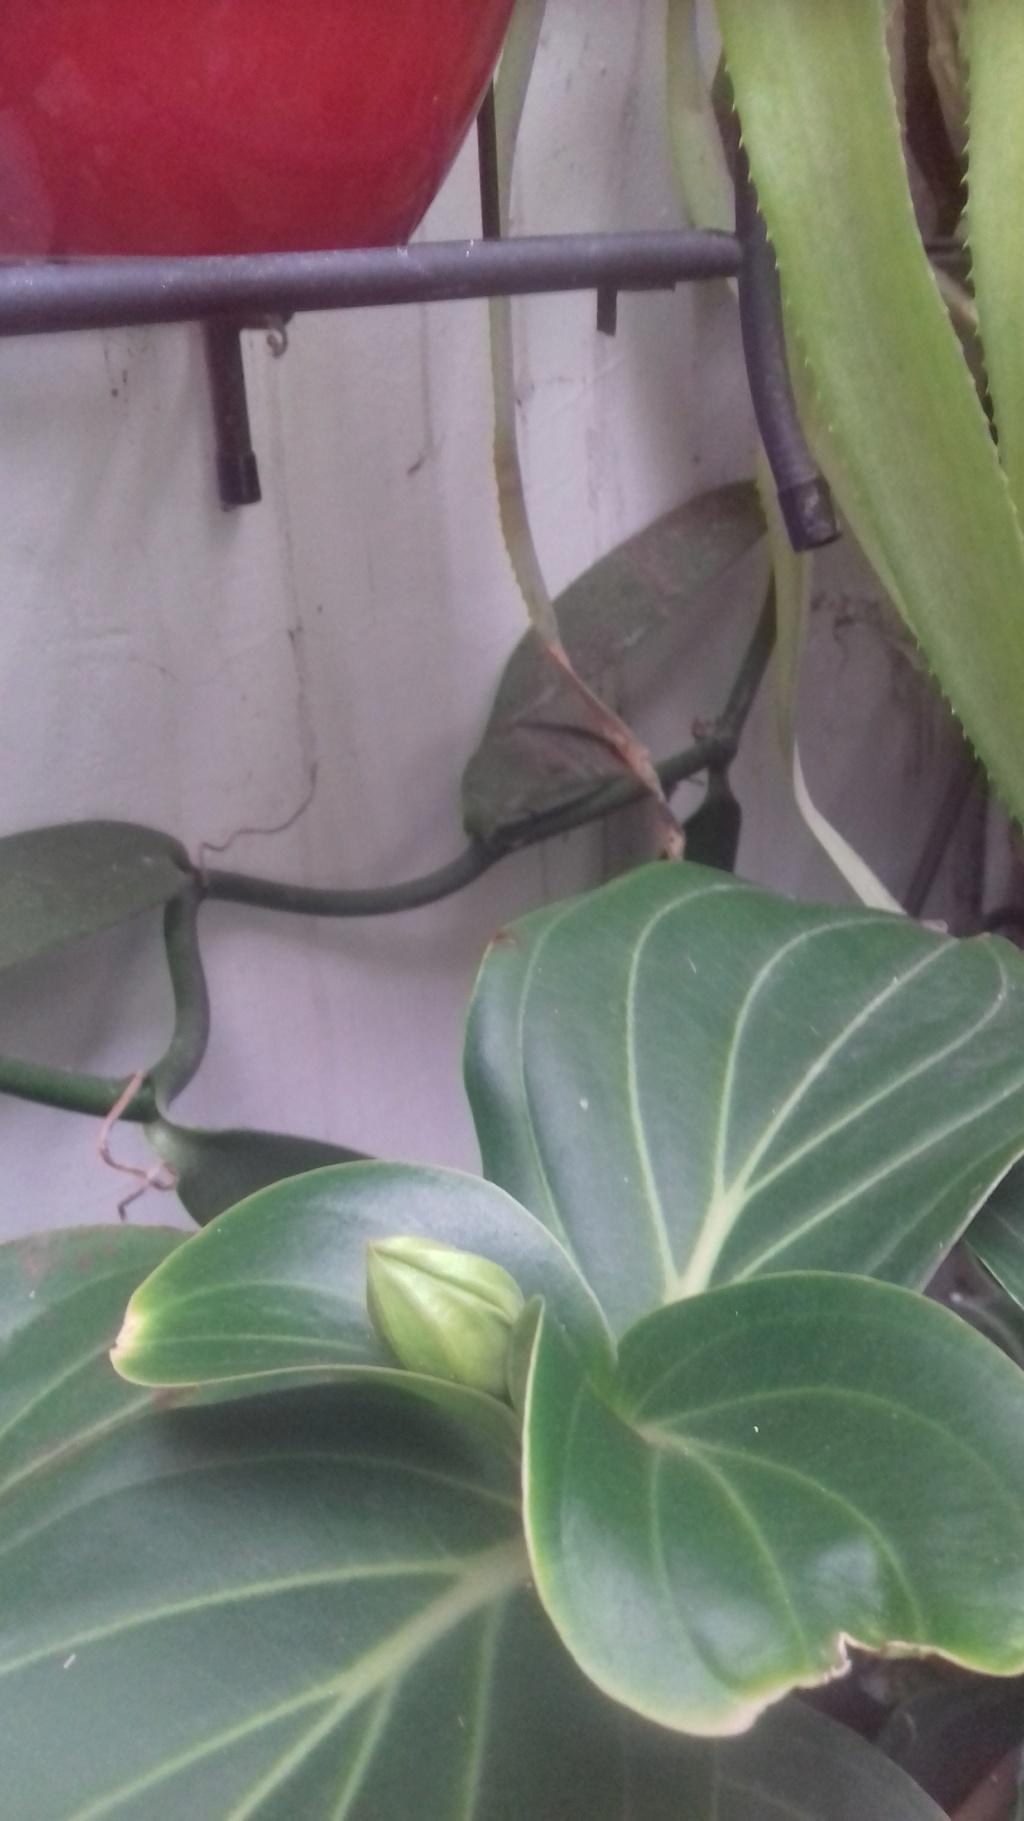 Mes plantes dans la véranda - Page 10 02615